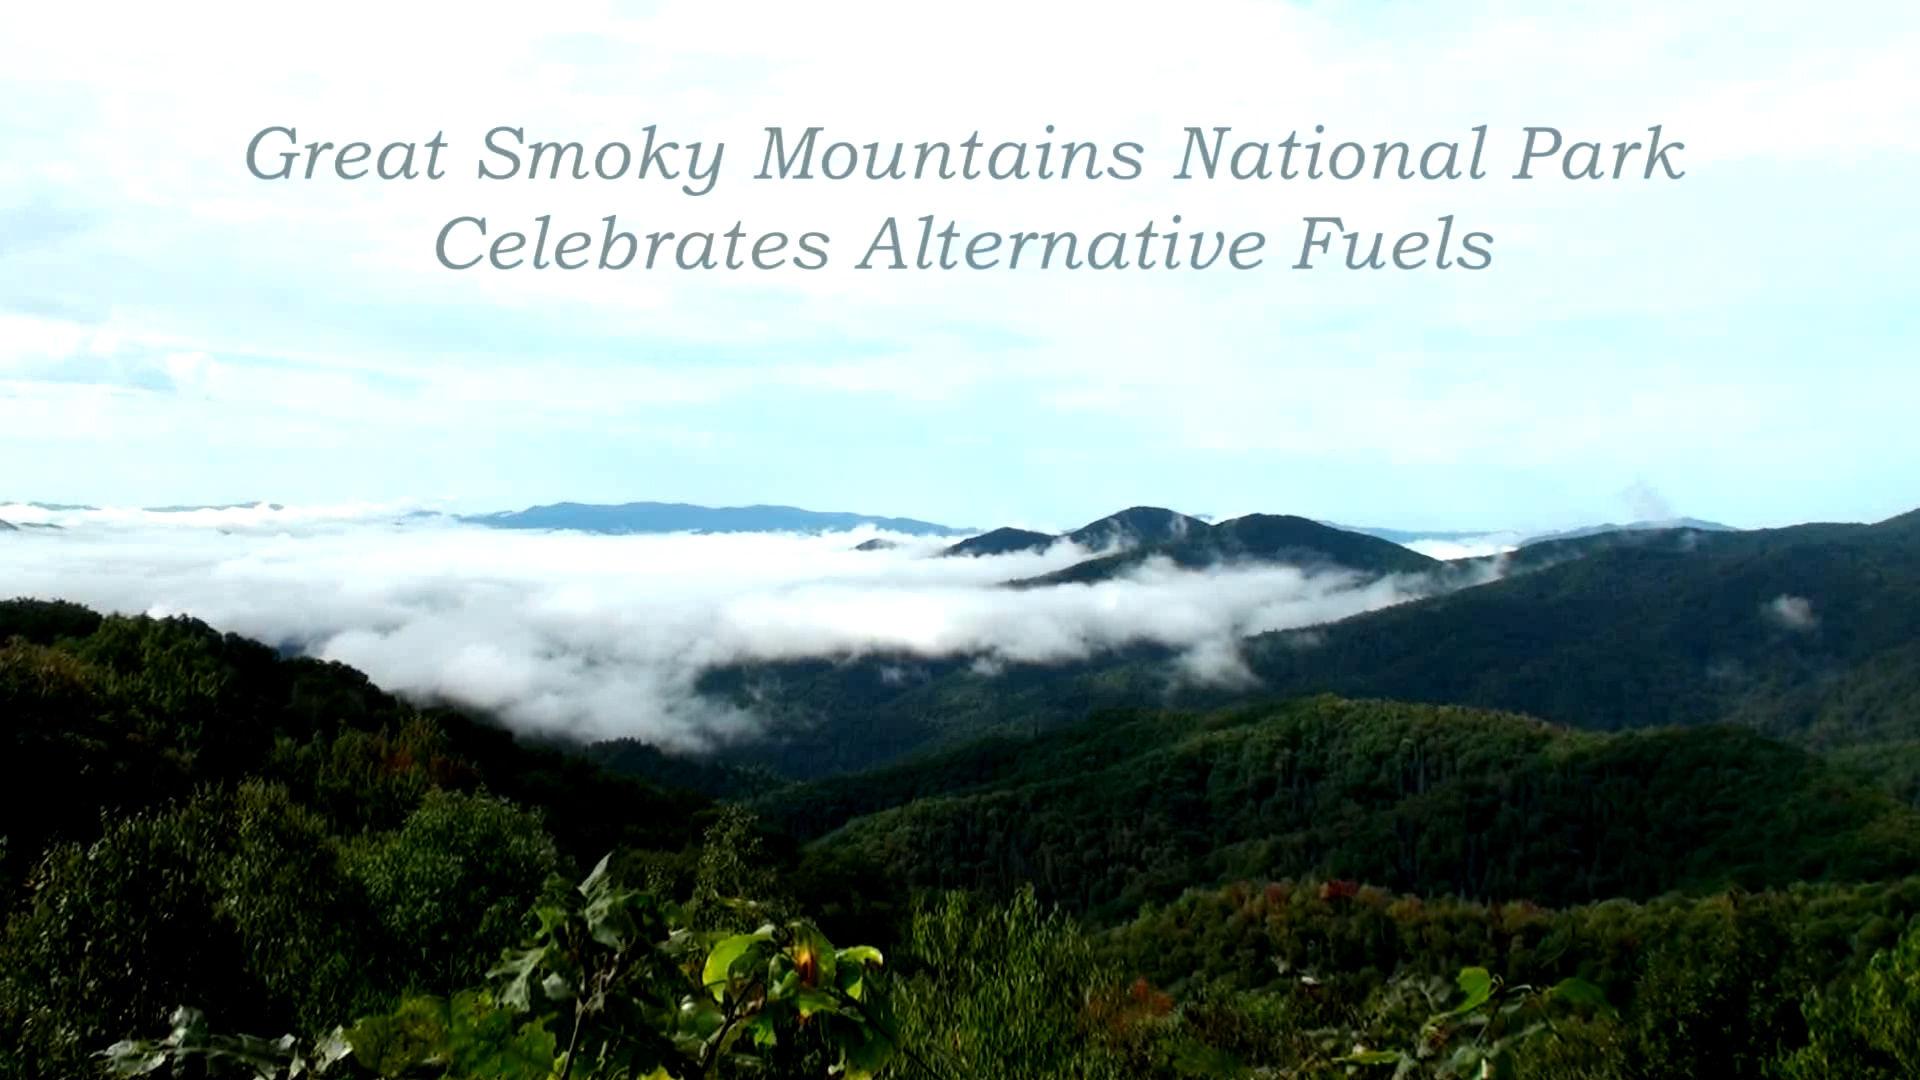 Great Smoky Mountains Celebrates Alternative Fuels